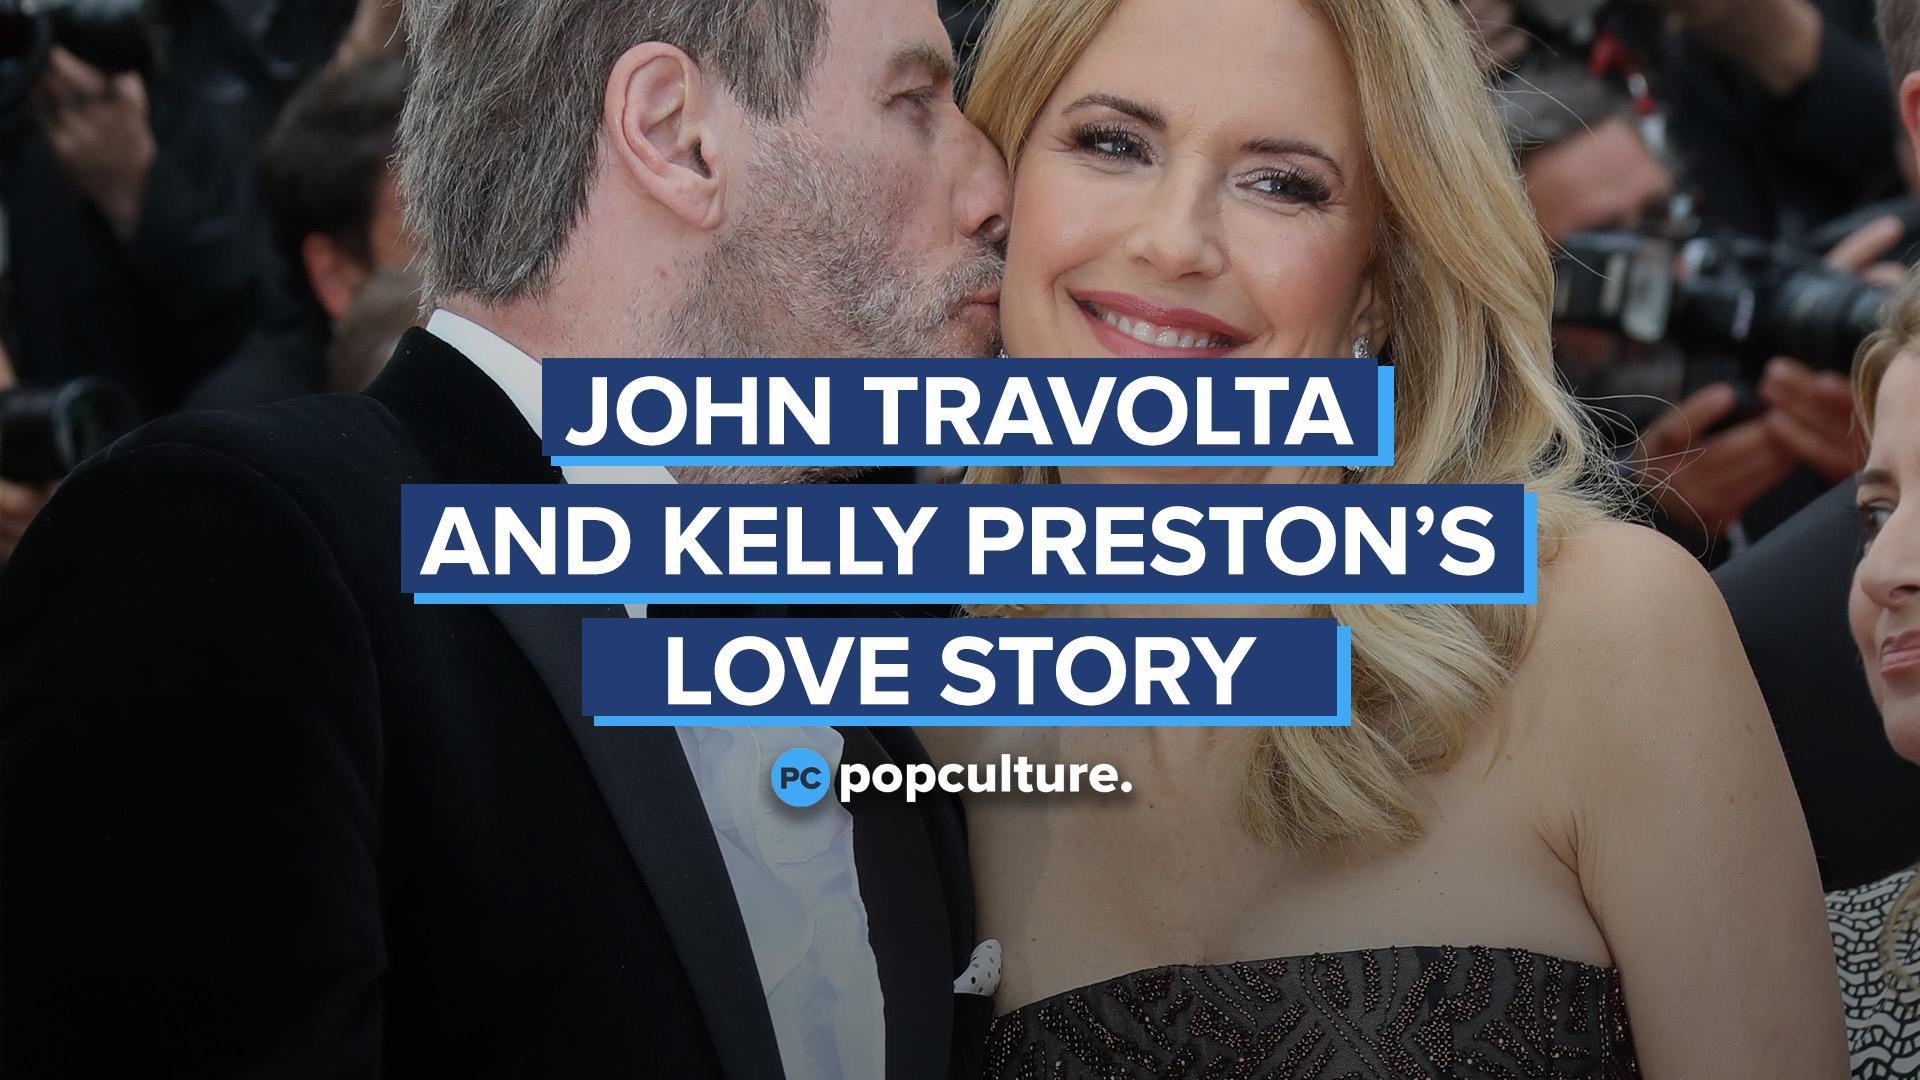 John Travolta and Kelly Preston's Love Story screen capture